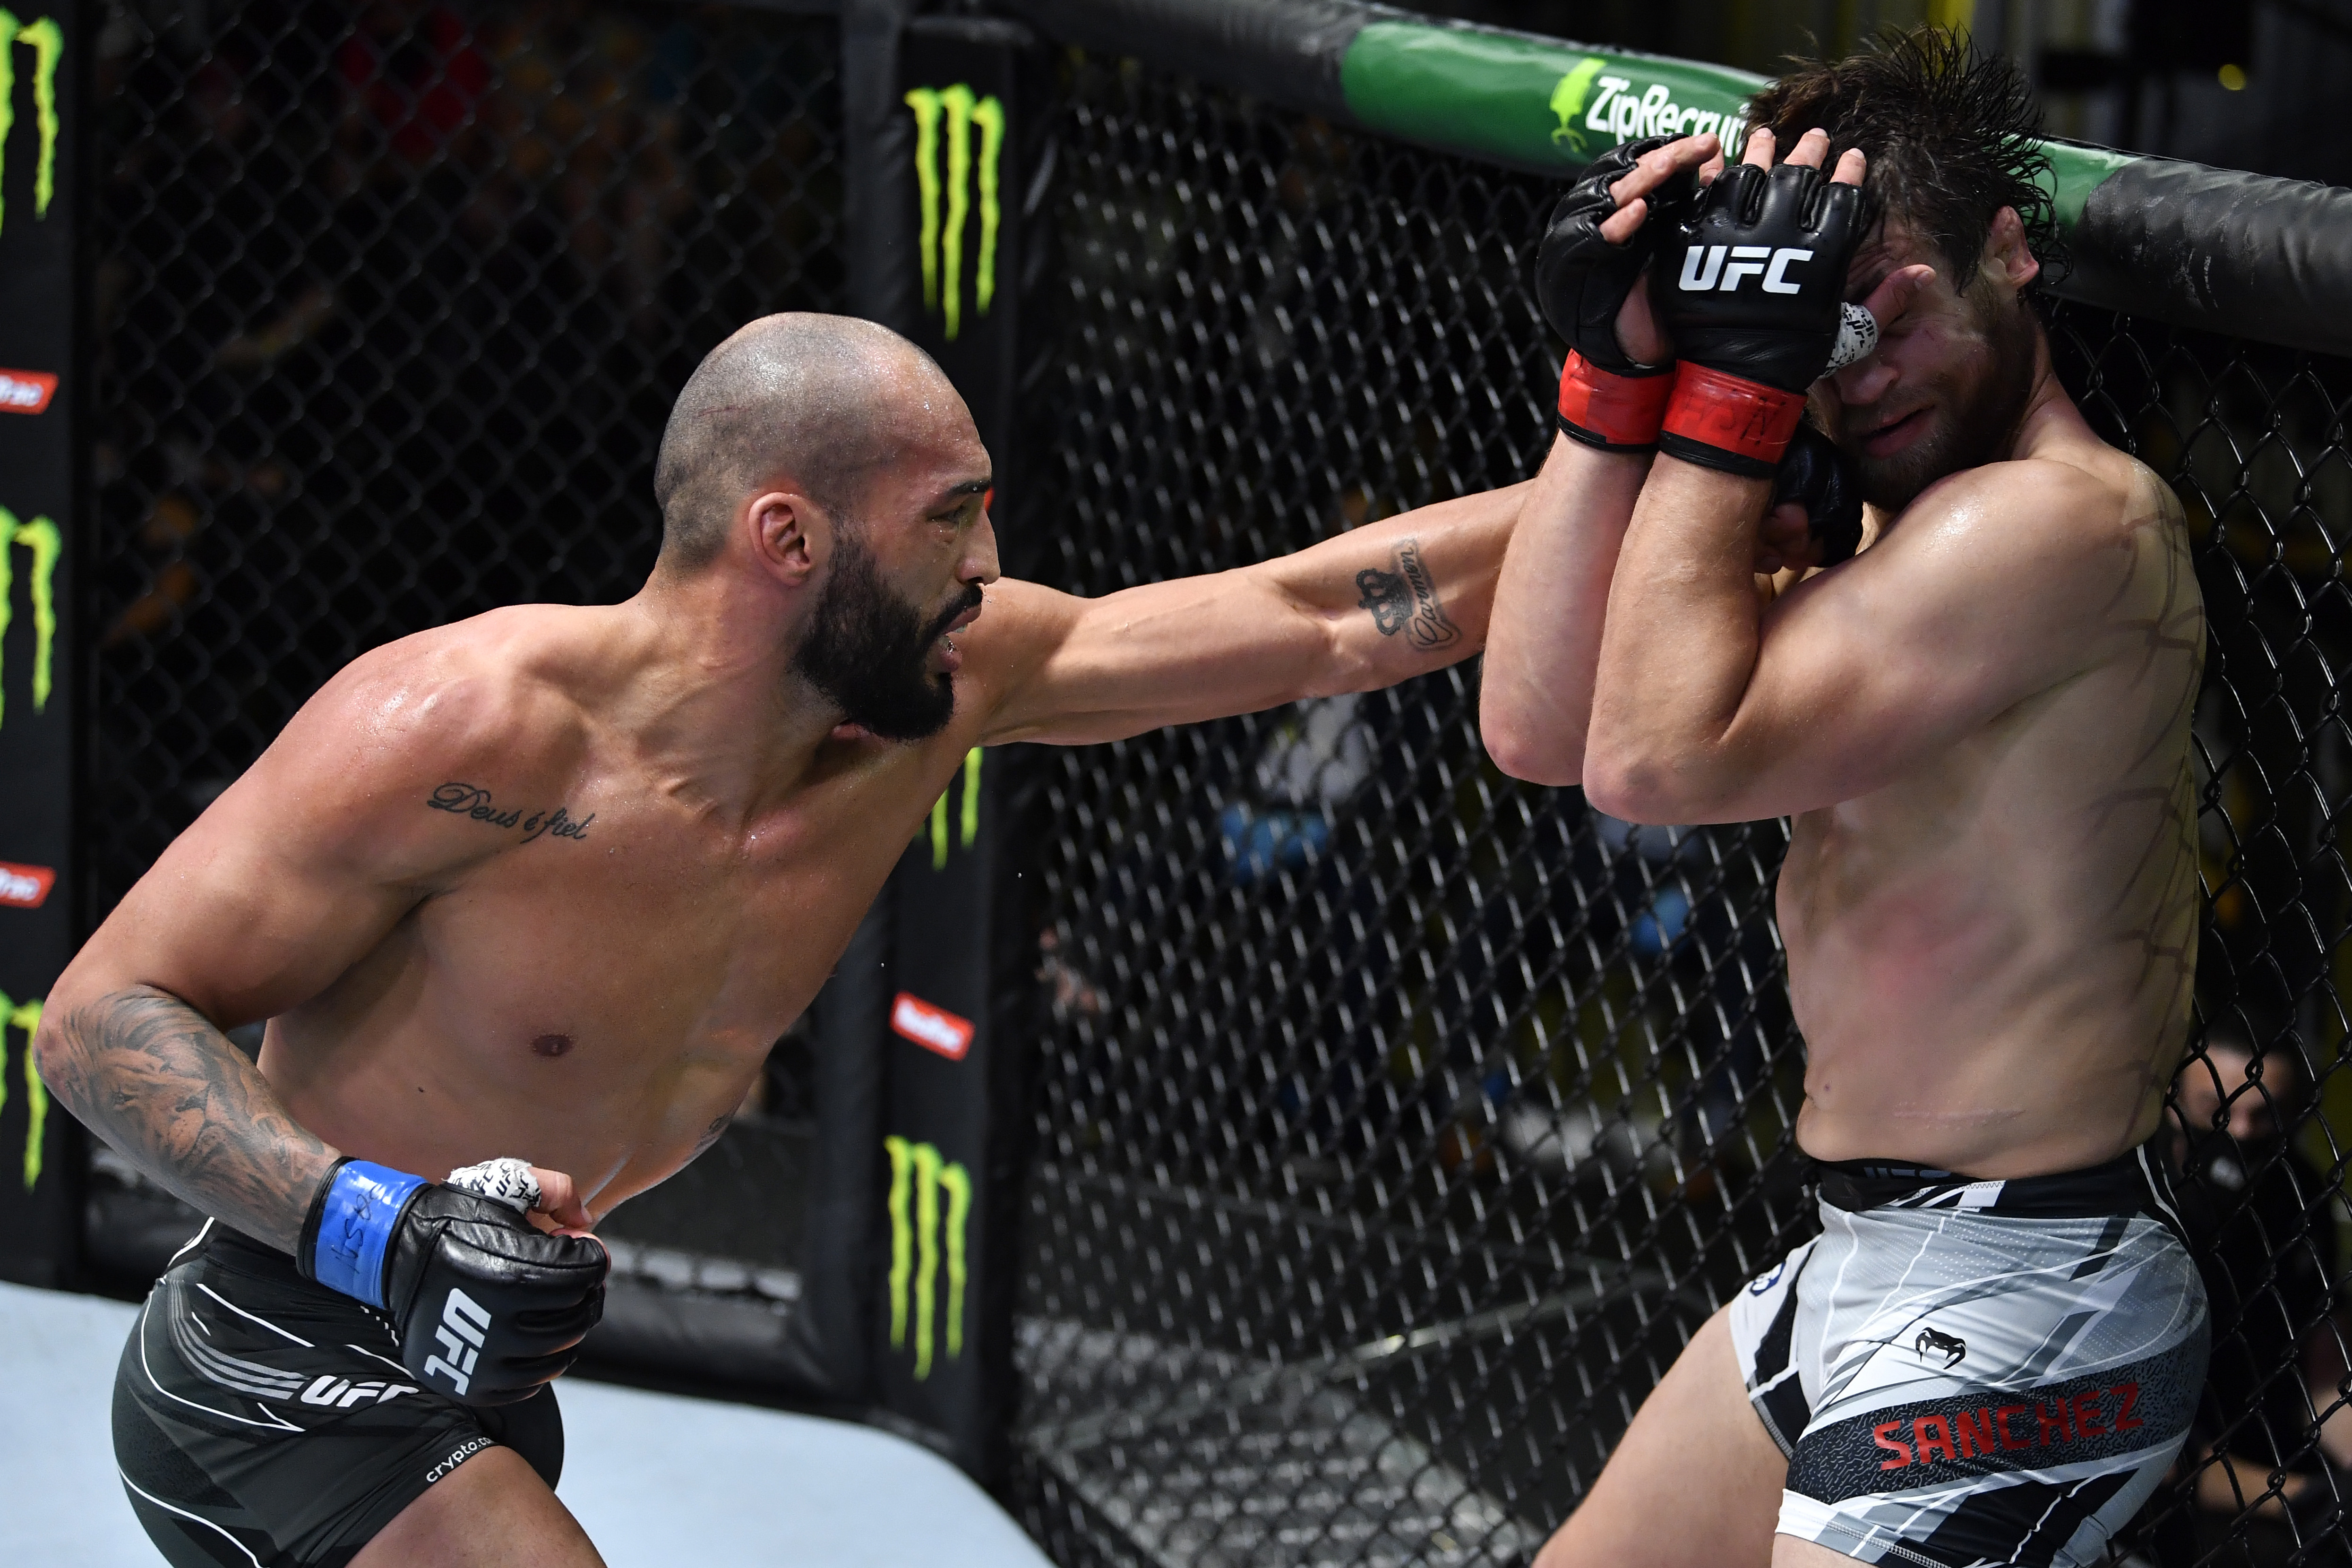 UFC Fight Night: Sanchez v Silva